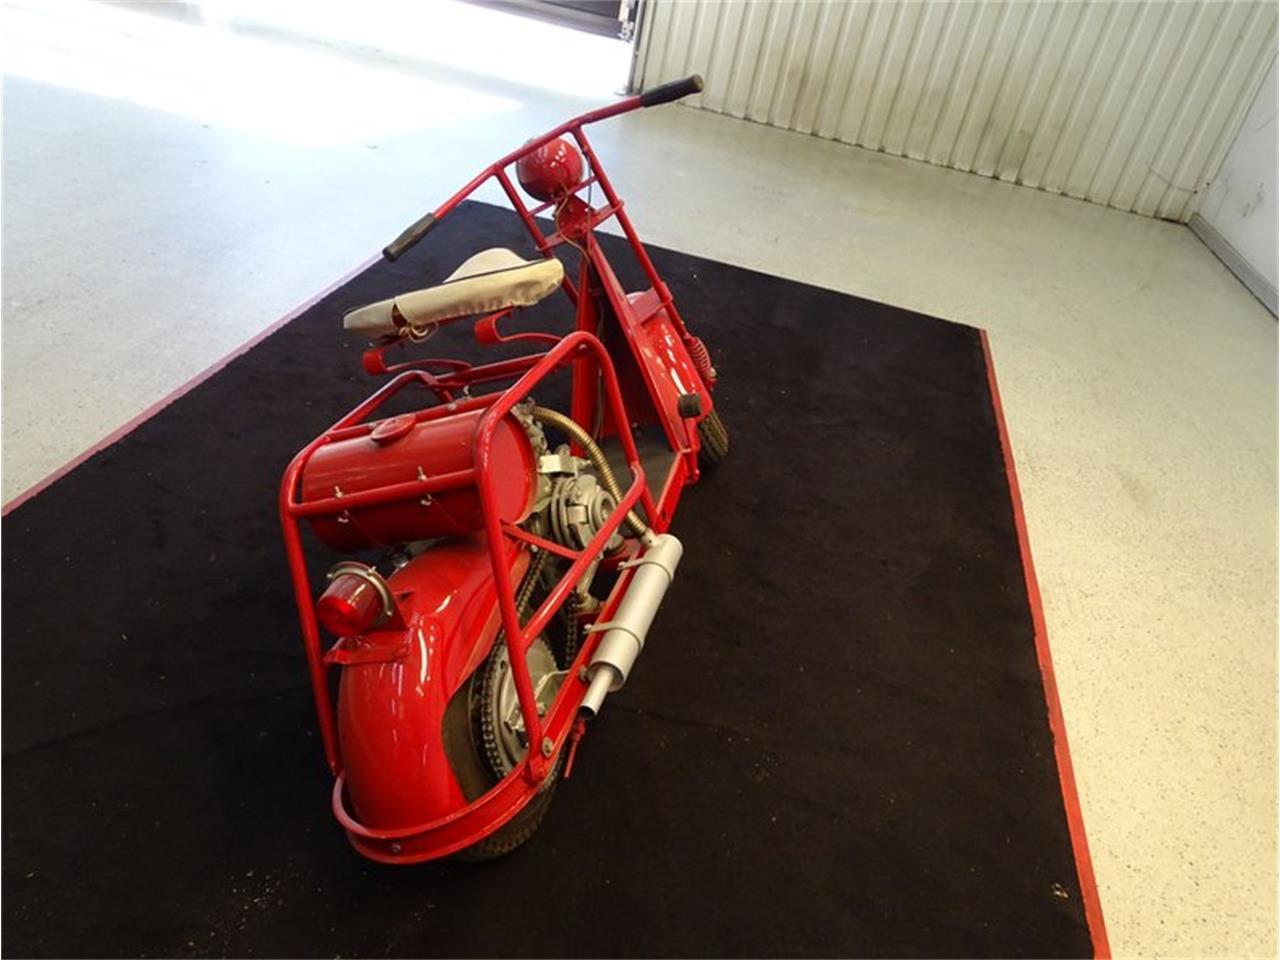 1952 Cushman Scooter (CC-1389536) for sale in Greensboro, North Carolina